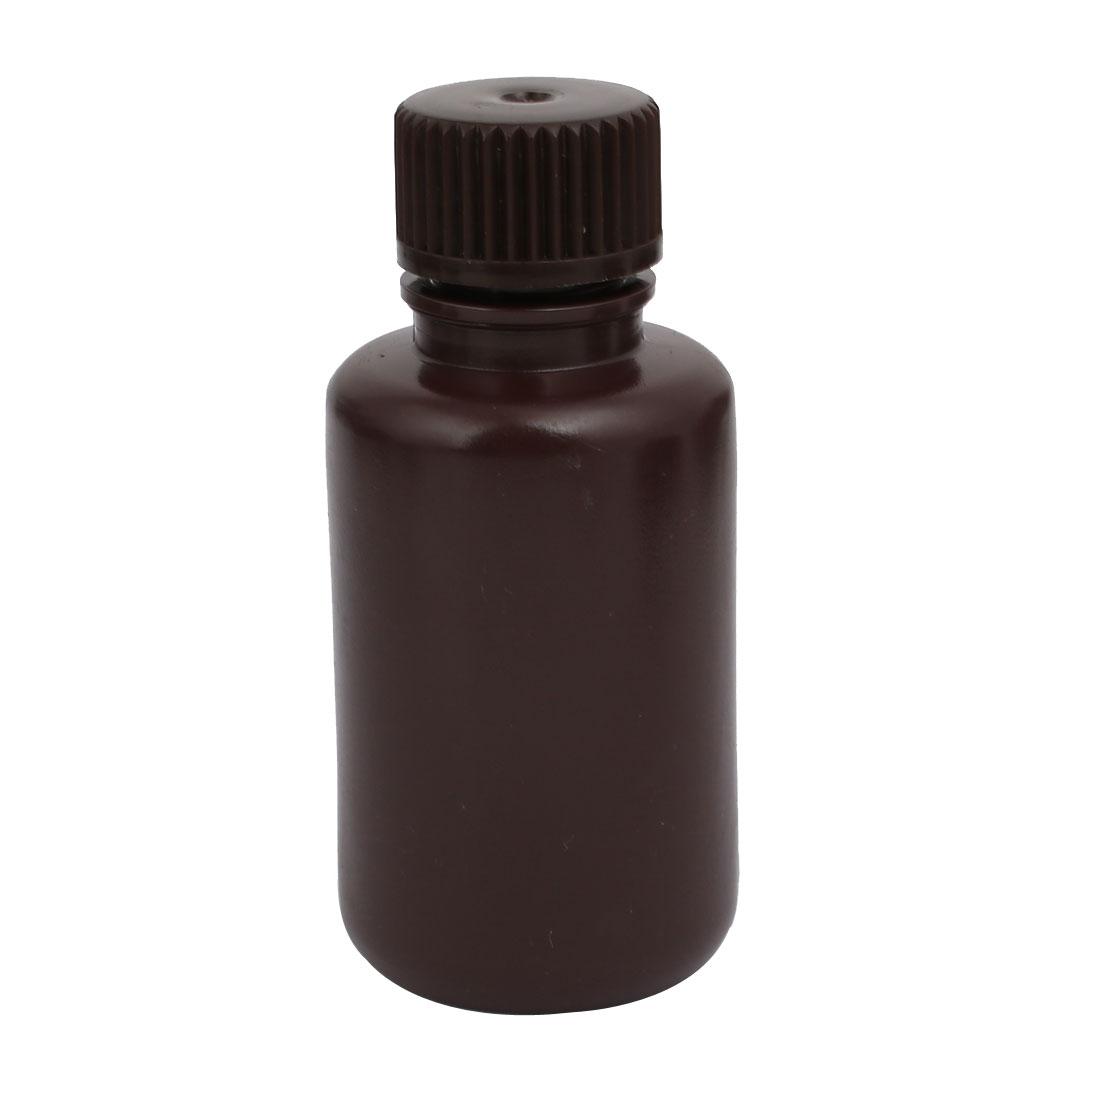 60ml Plastic Big Mouth Chemical Laboratory Reagent Bottle Sealling Bottle Brown